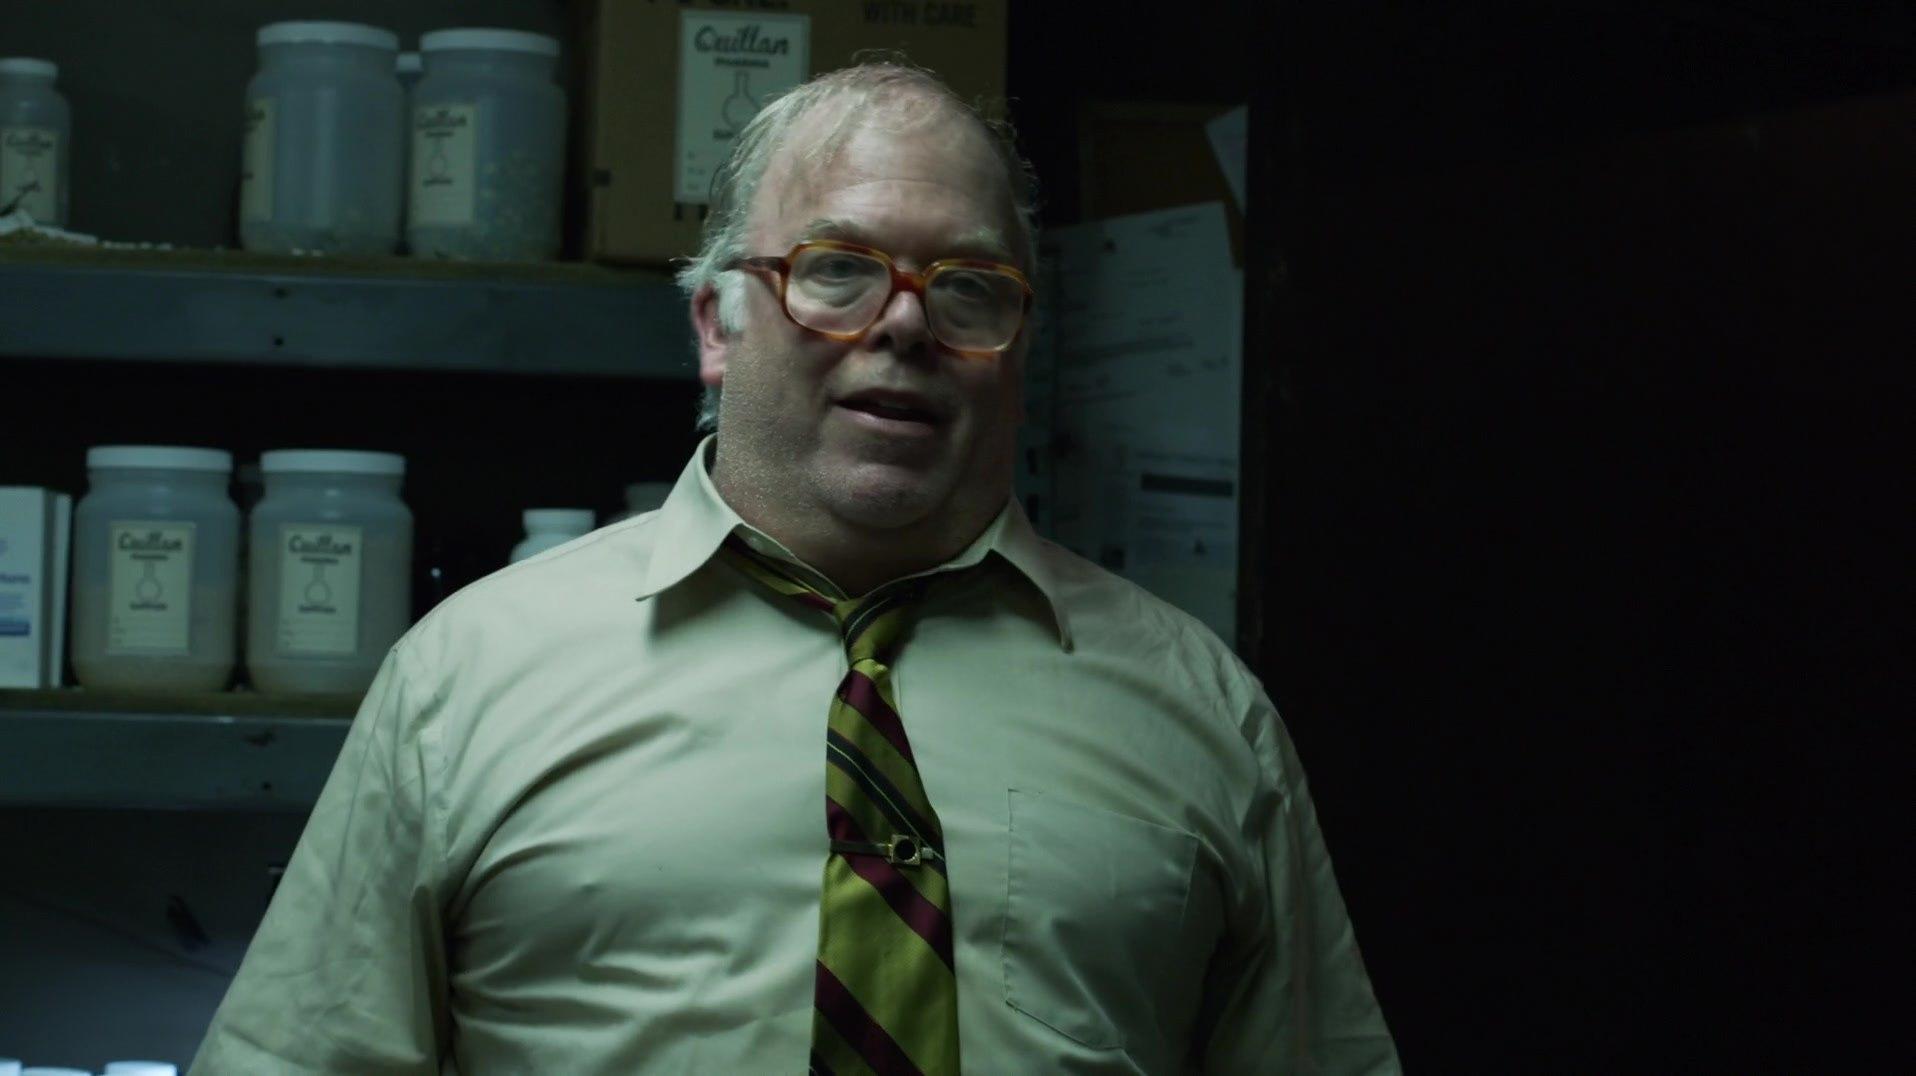 Morry Quillan (Gotham)